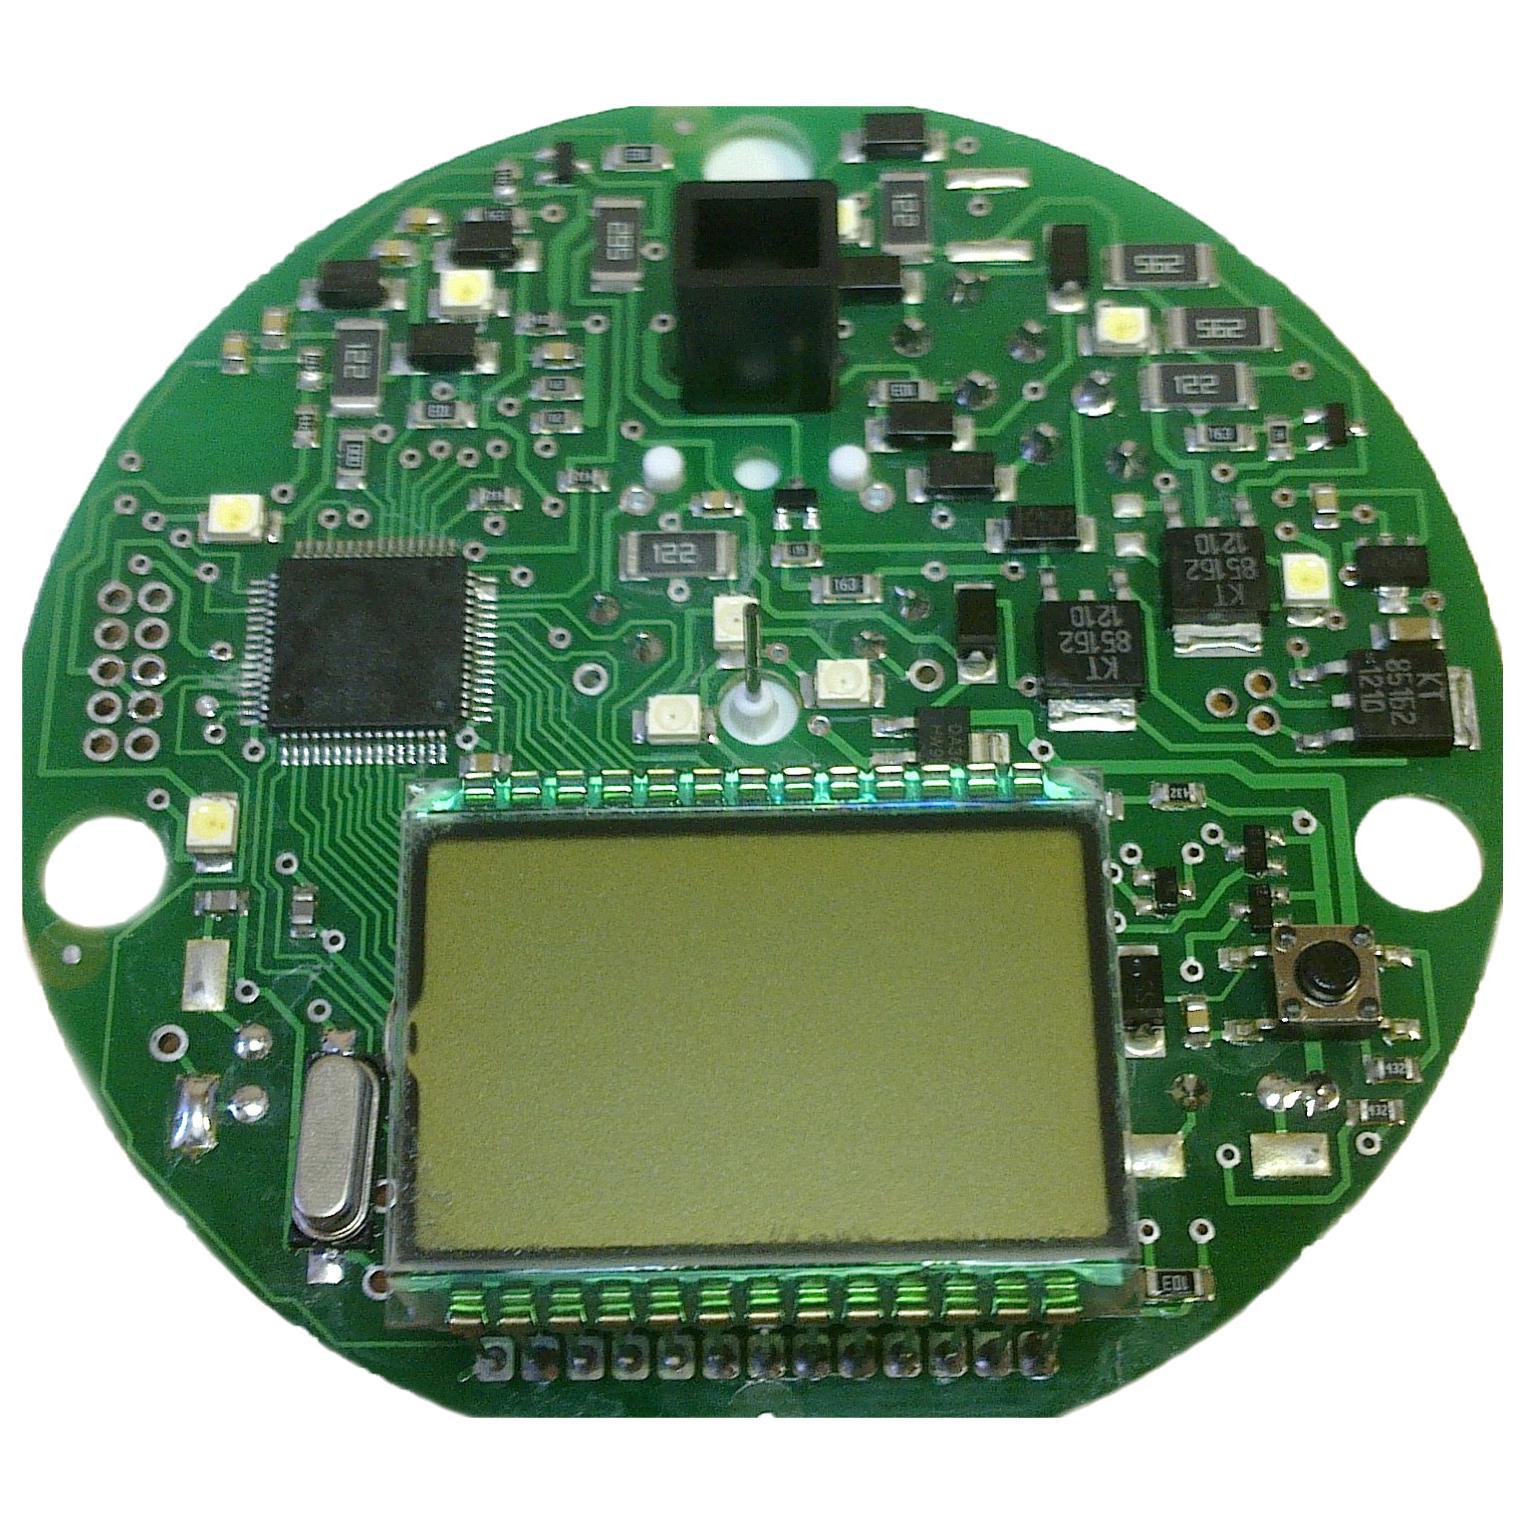 электронный ключ на кт315 и кт 805 а схема